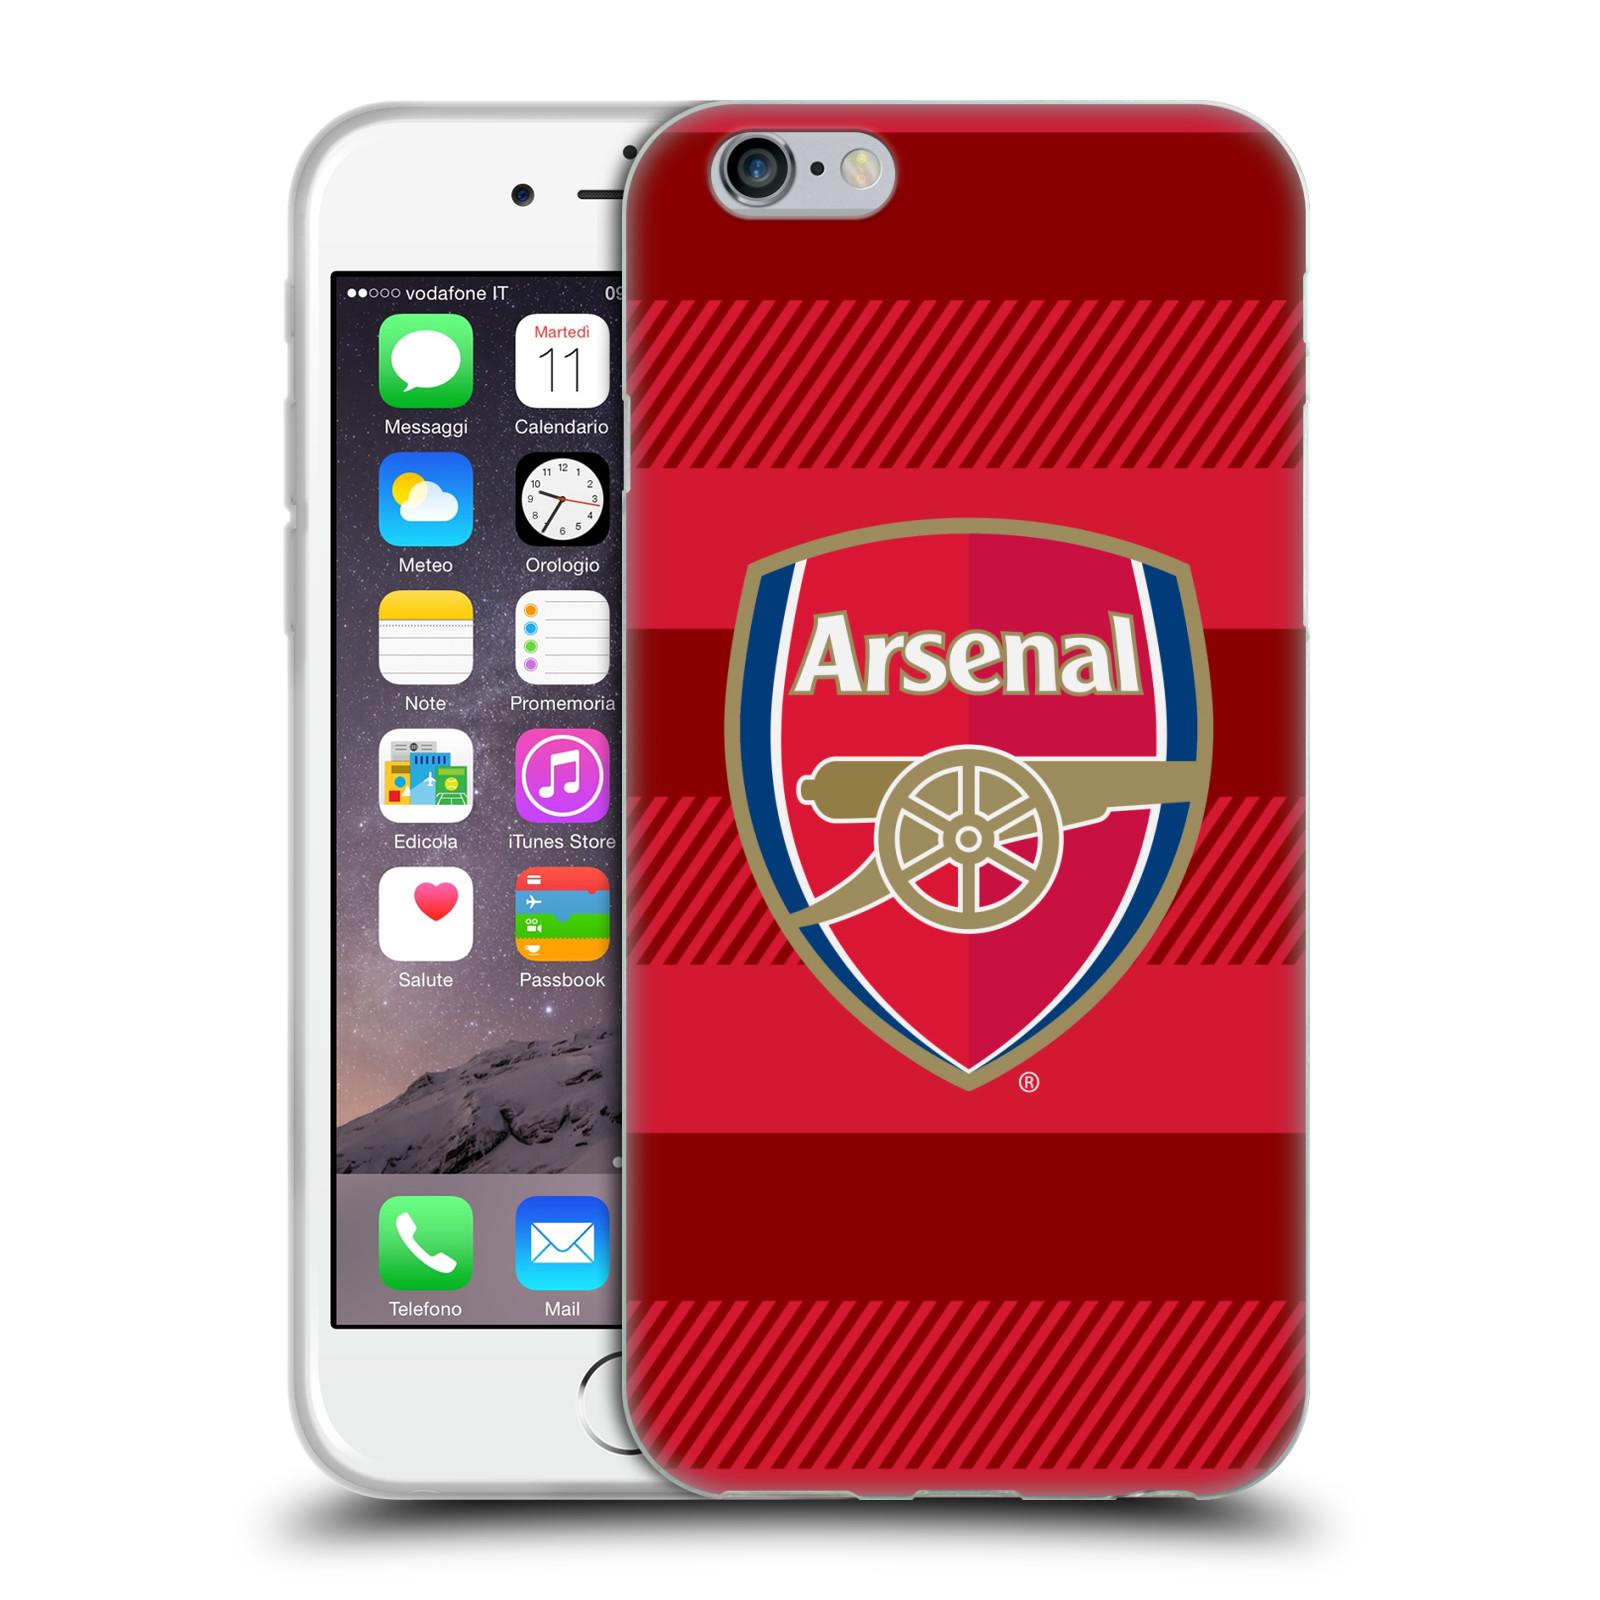 Silikonové pouzdro na mobil Apple iPhone 6 - Head Case - Arsenal FC - Logo s pruhy